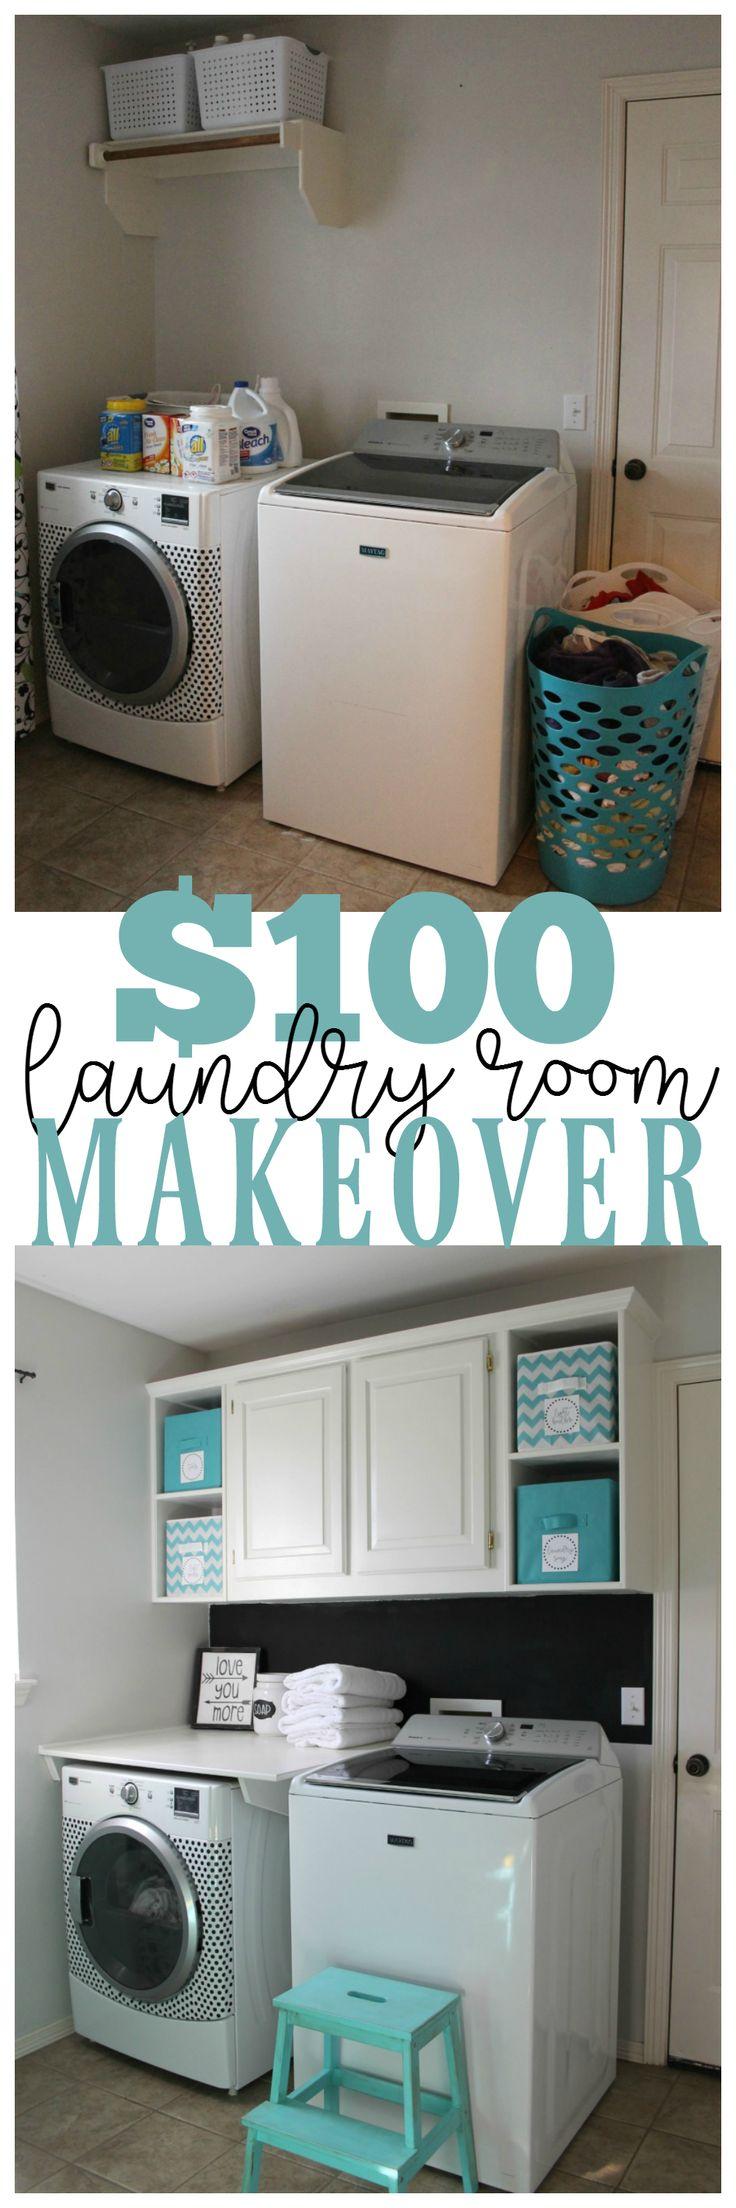 Best 20+ Laundry room storage ideas on Pinterest